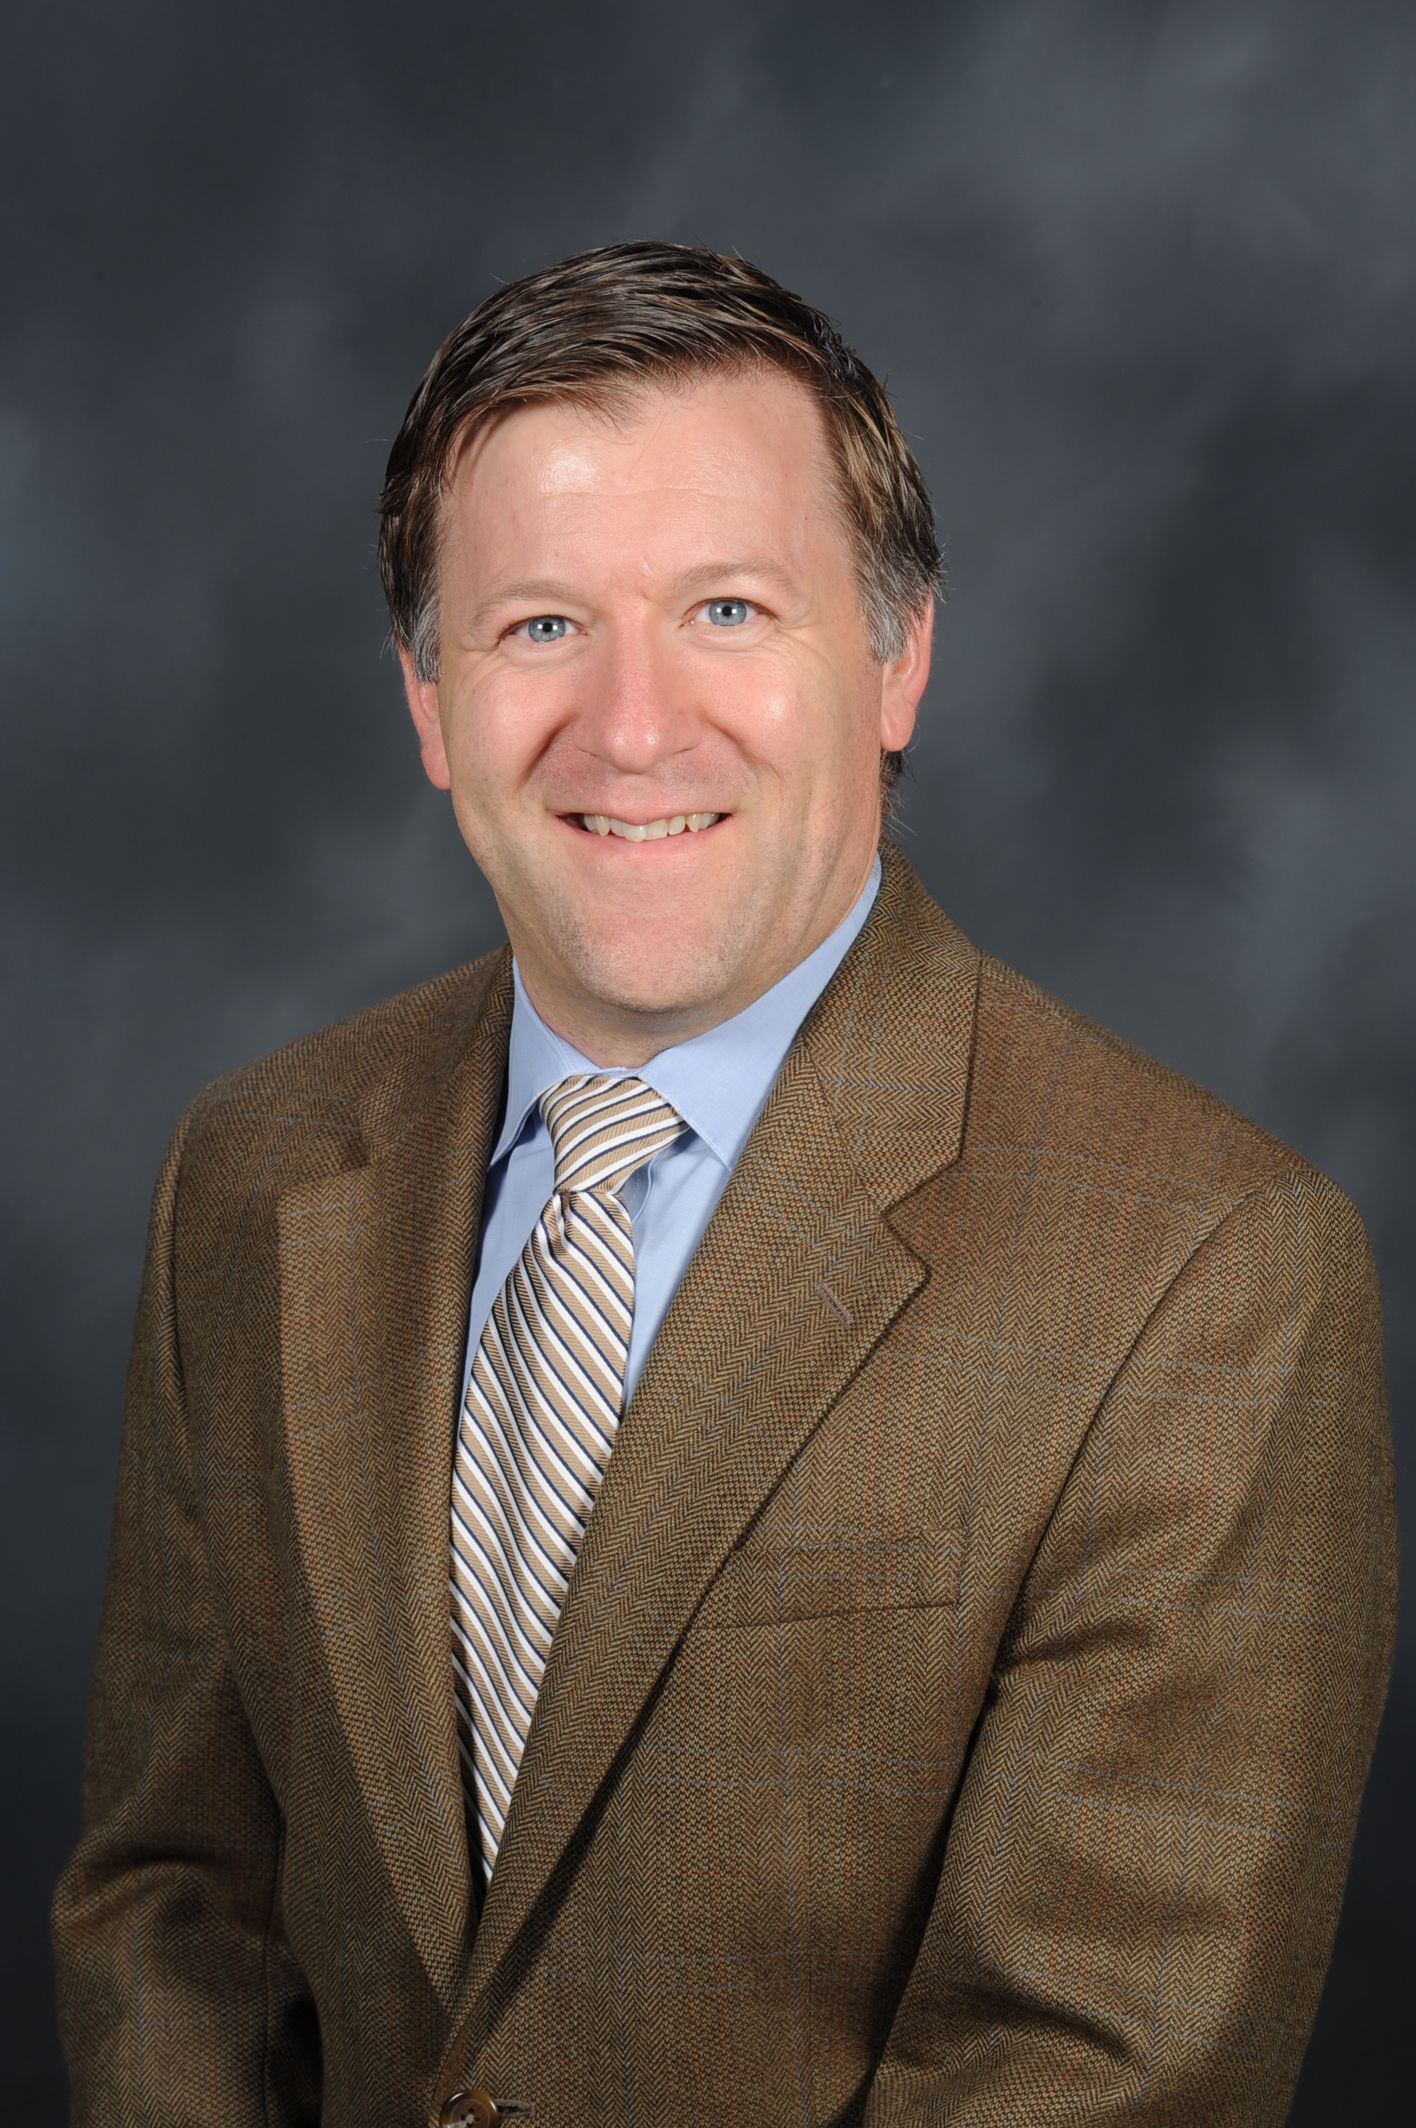 Interview with Brendan Cunningham - Horolonomics